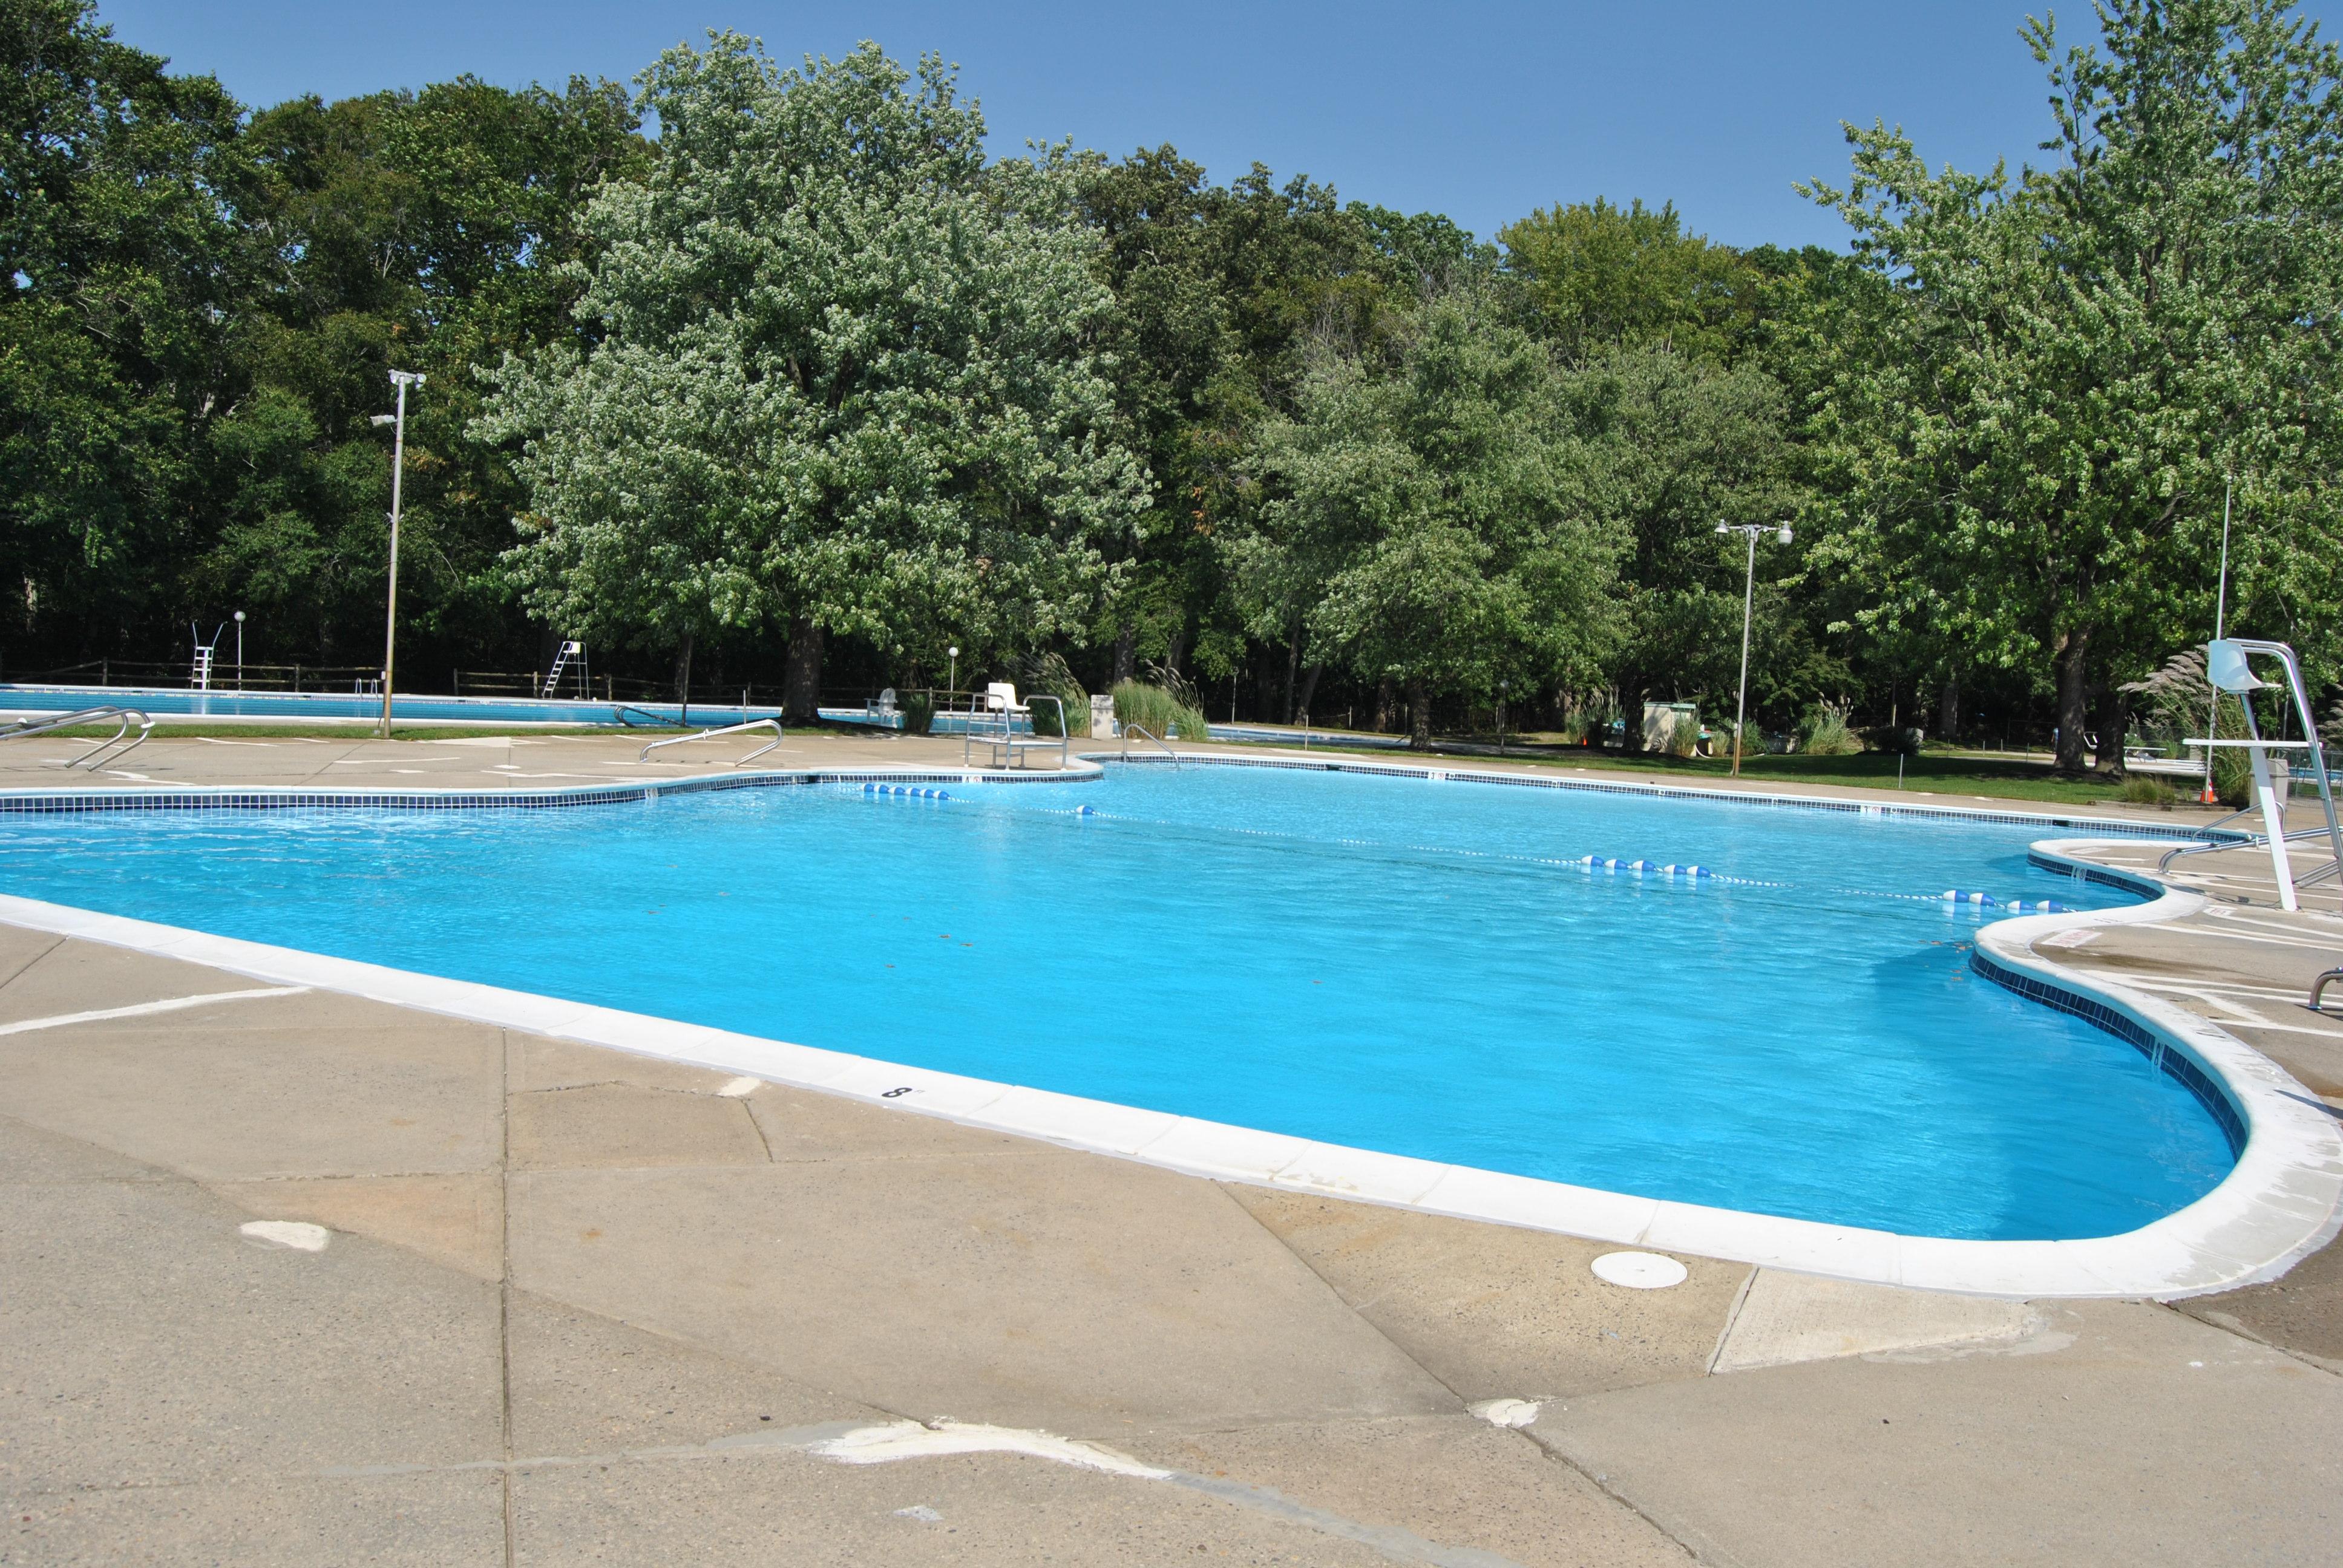 Ramblewood Swim Club image 12